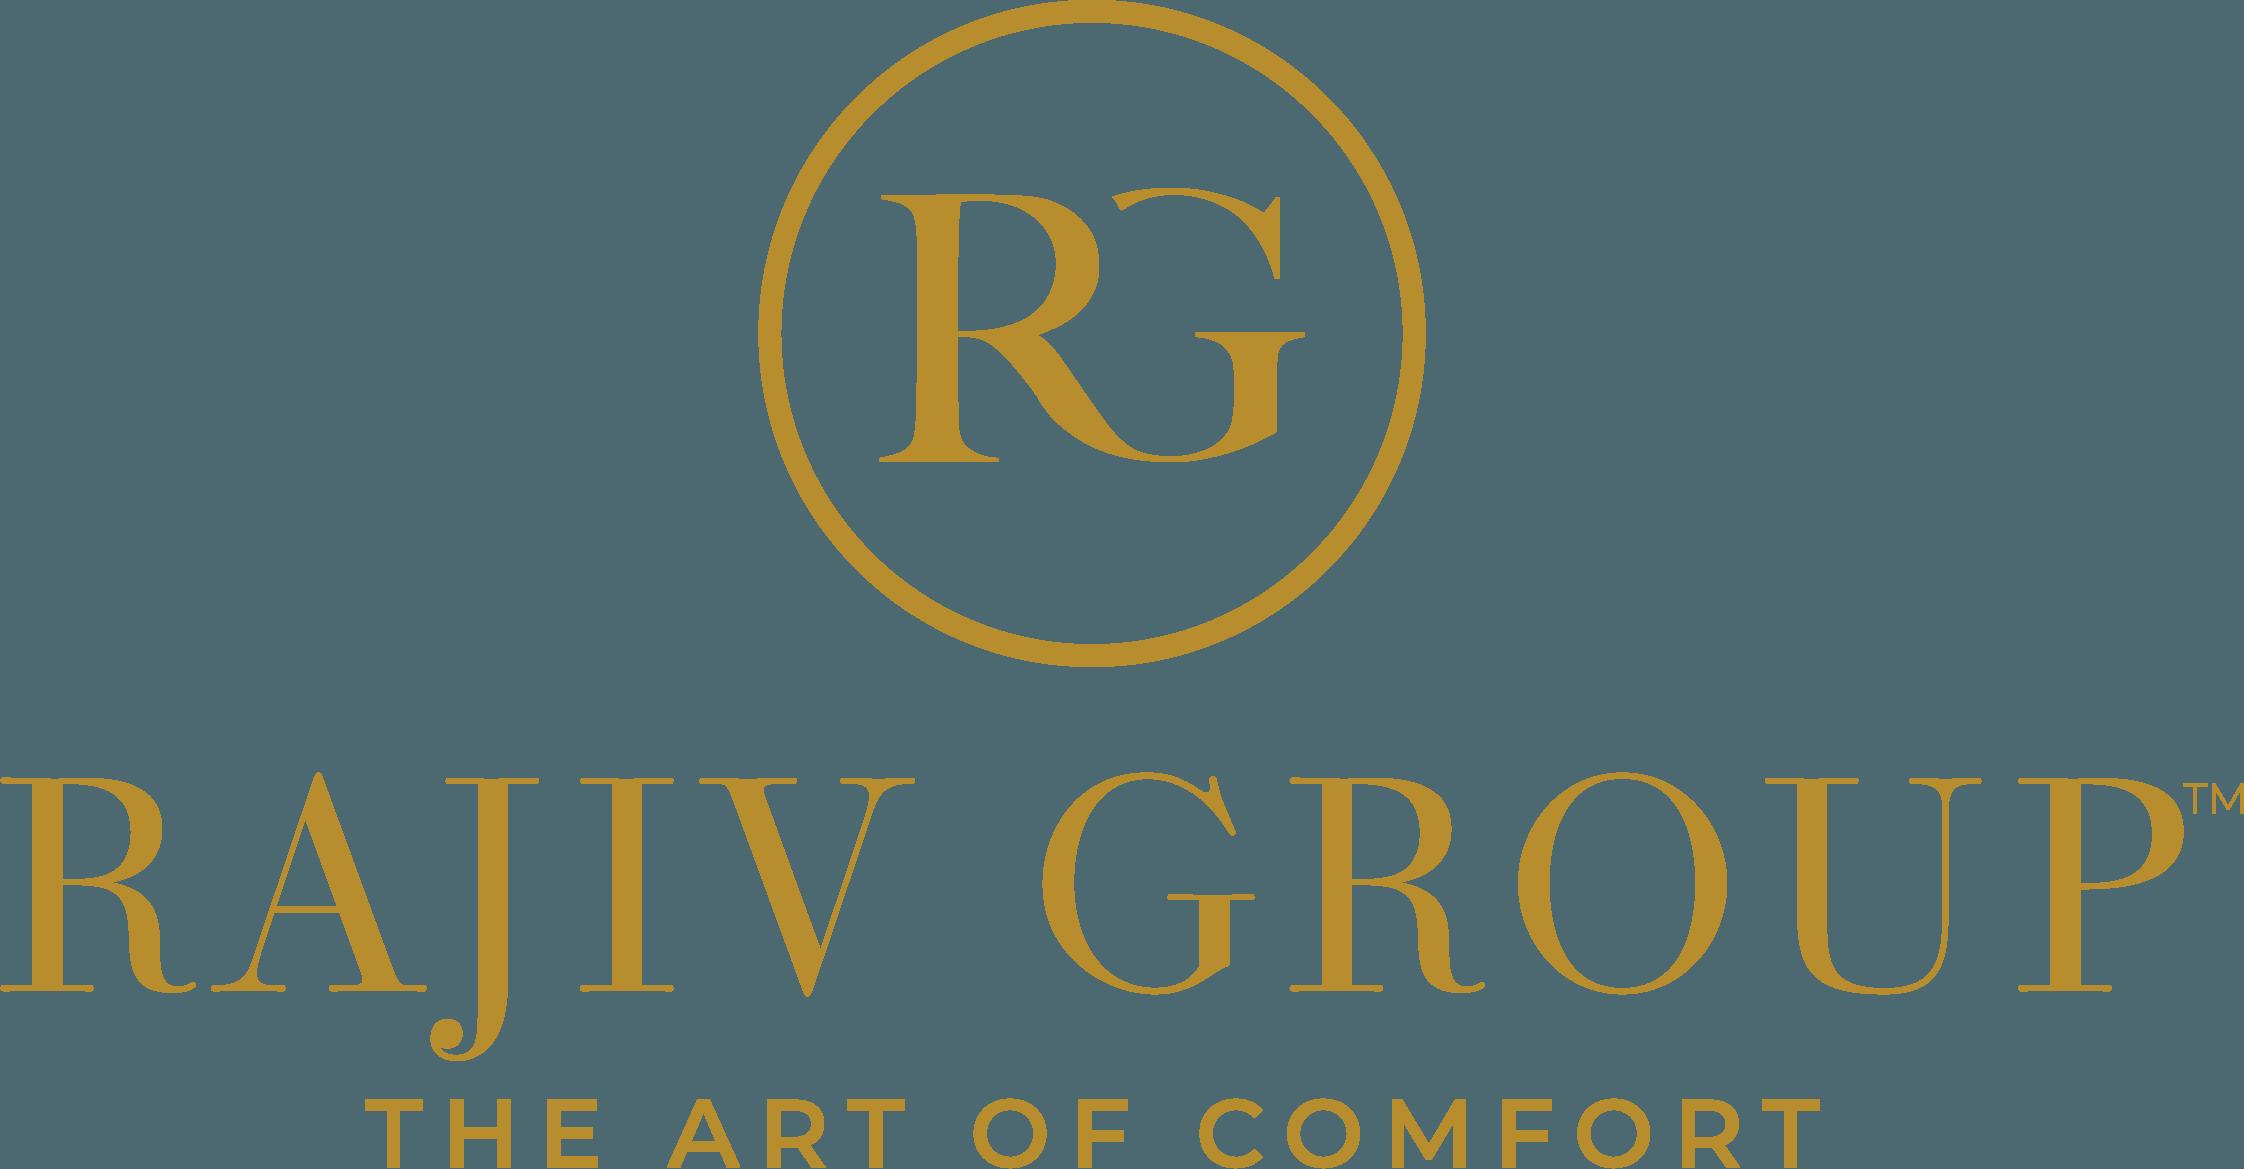 https://www.rajivgroup.in/wp-content/uploads/2021/02/Asset-2Logo-full-1.png